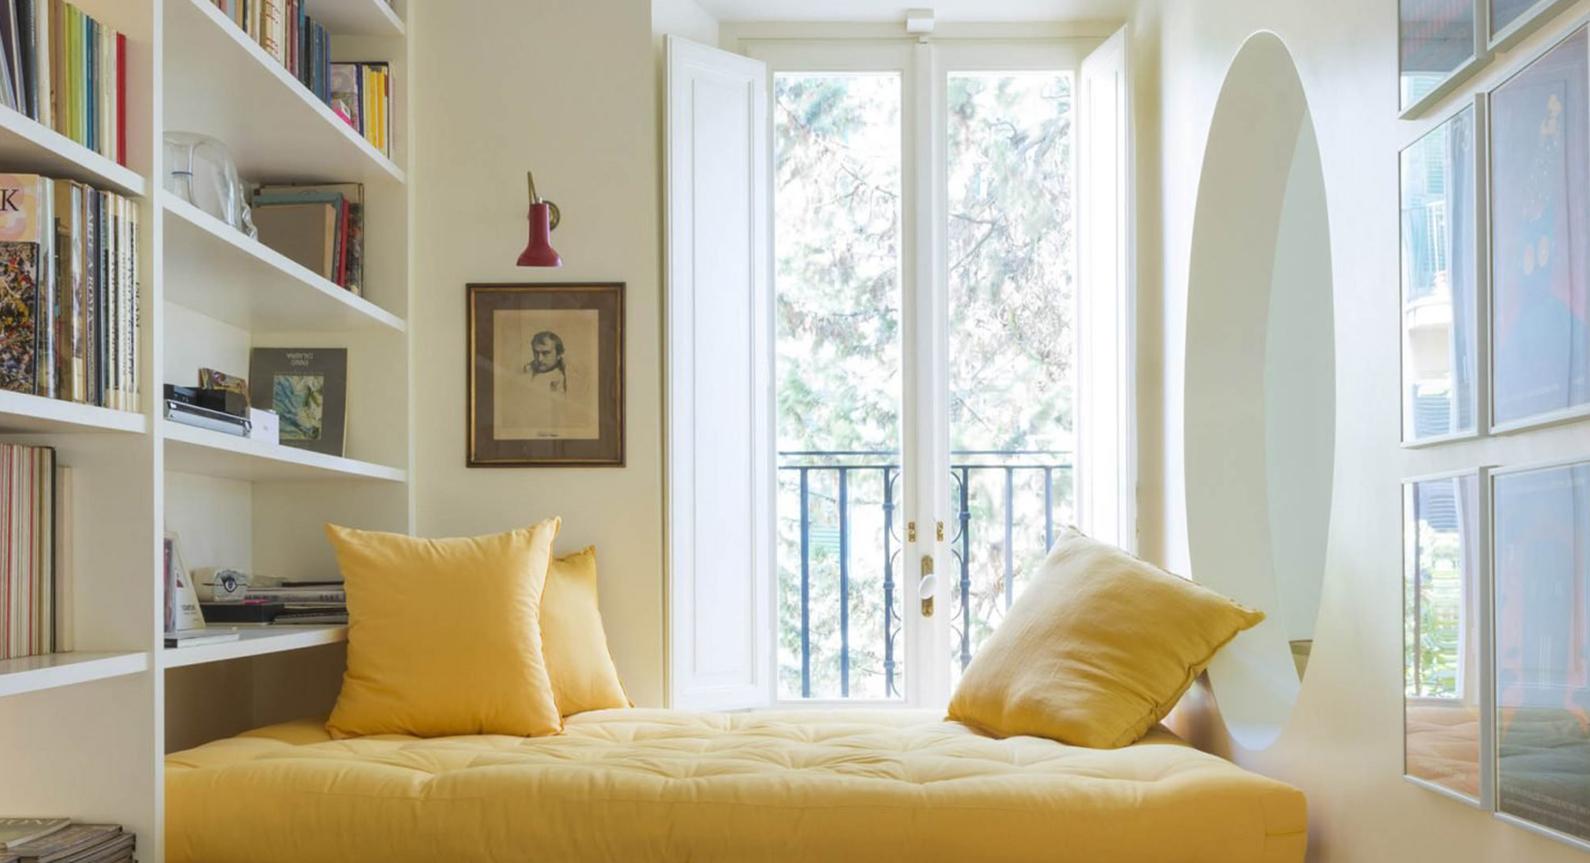 Studio Strato Creates A Unique Reading Area In This Tiny Rome Apartment